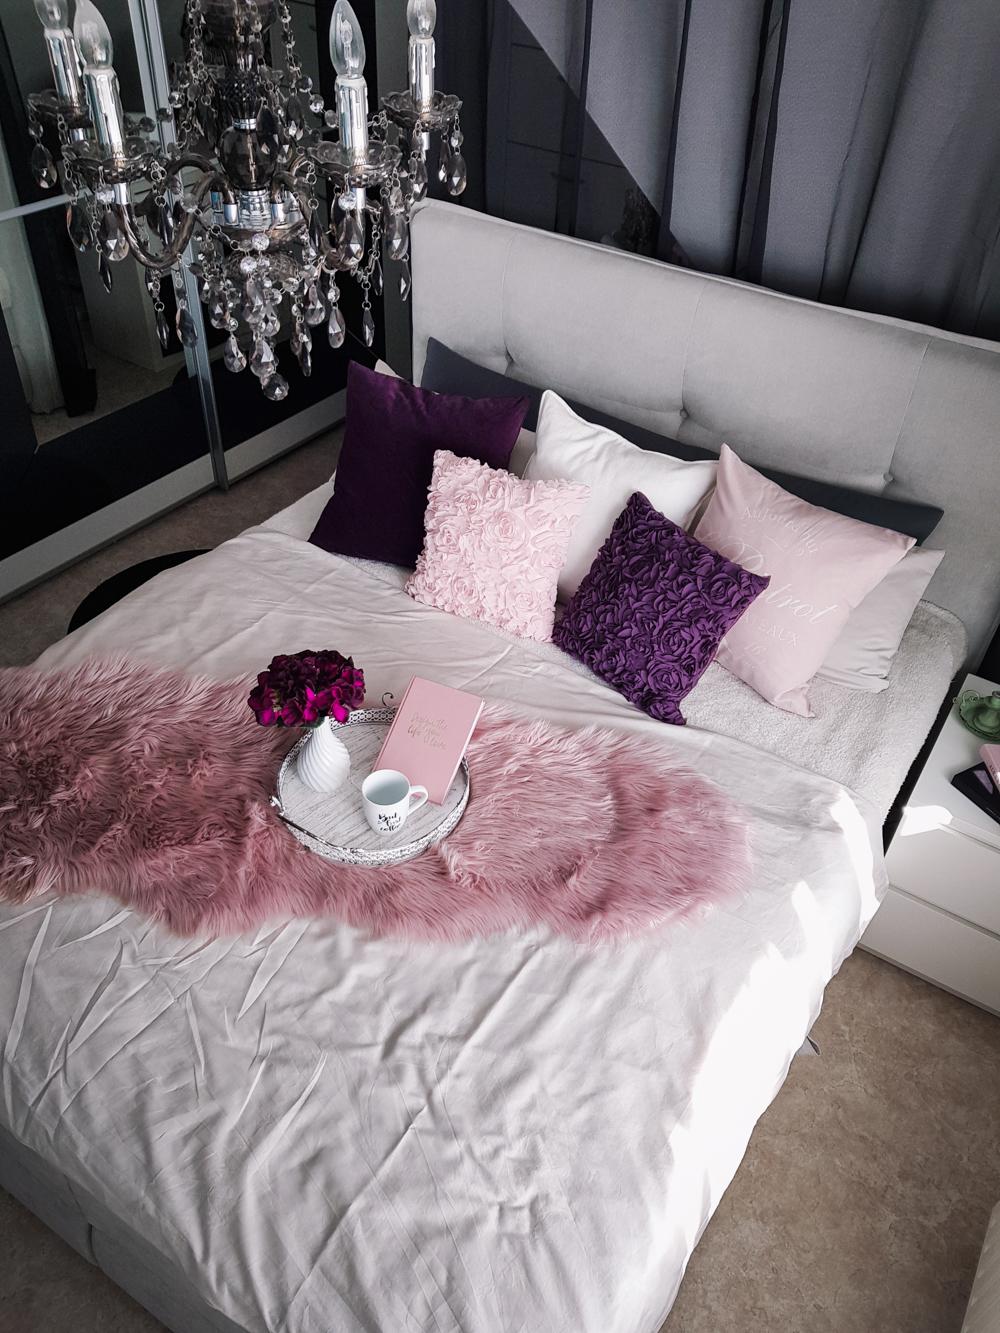 Schlafzimmer Interior Einrichtung Grau Rosa Lila Boxspringbett Otto